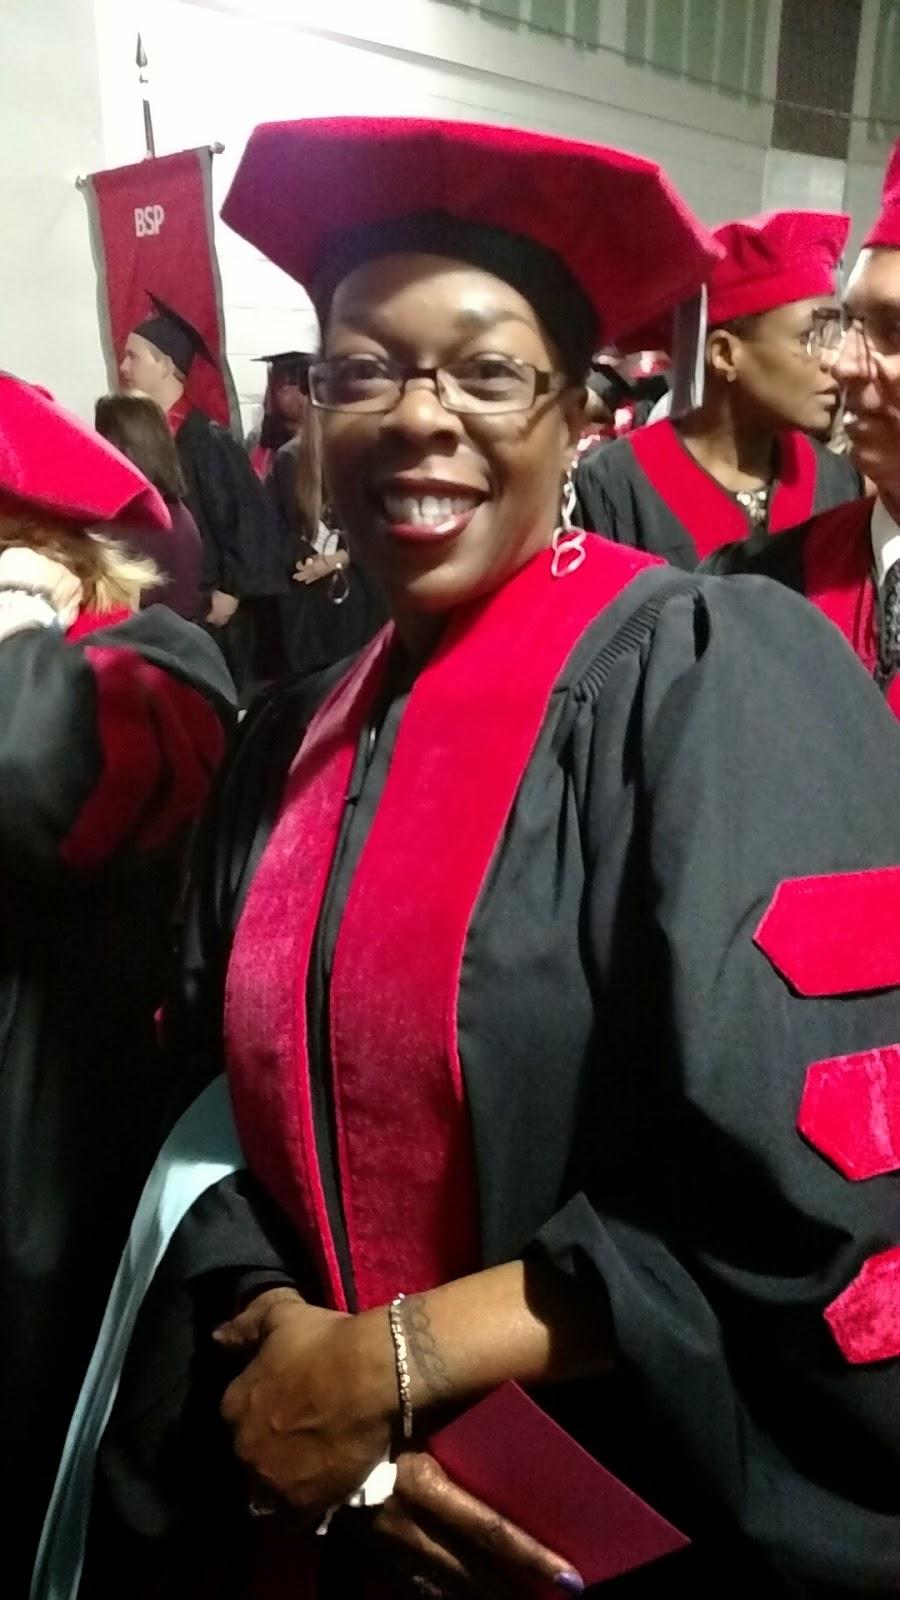 University Of Phoenix Graduation Pictures 2015 - Online Colleges All